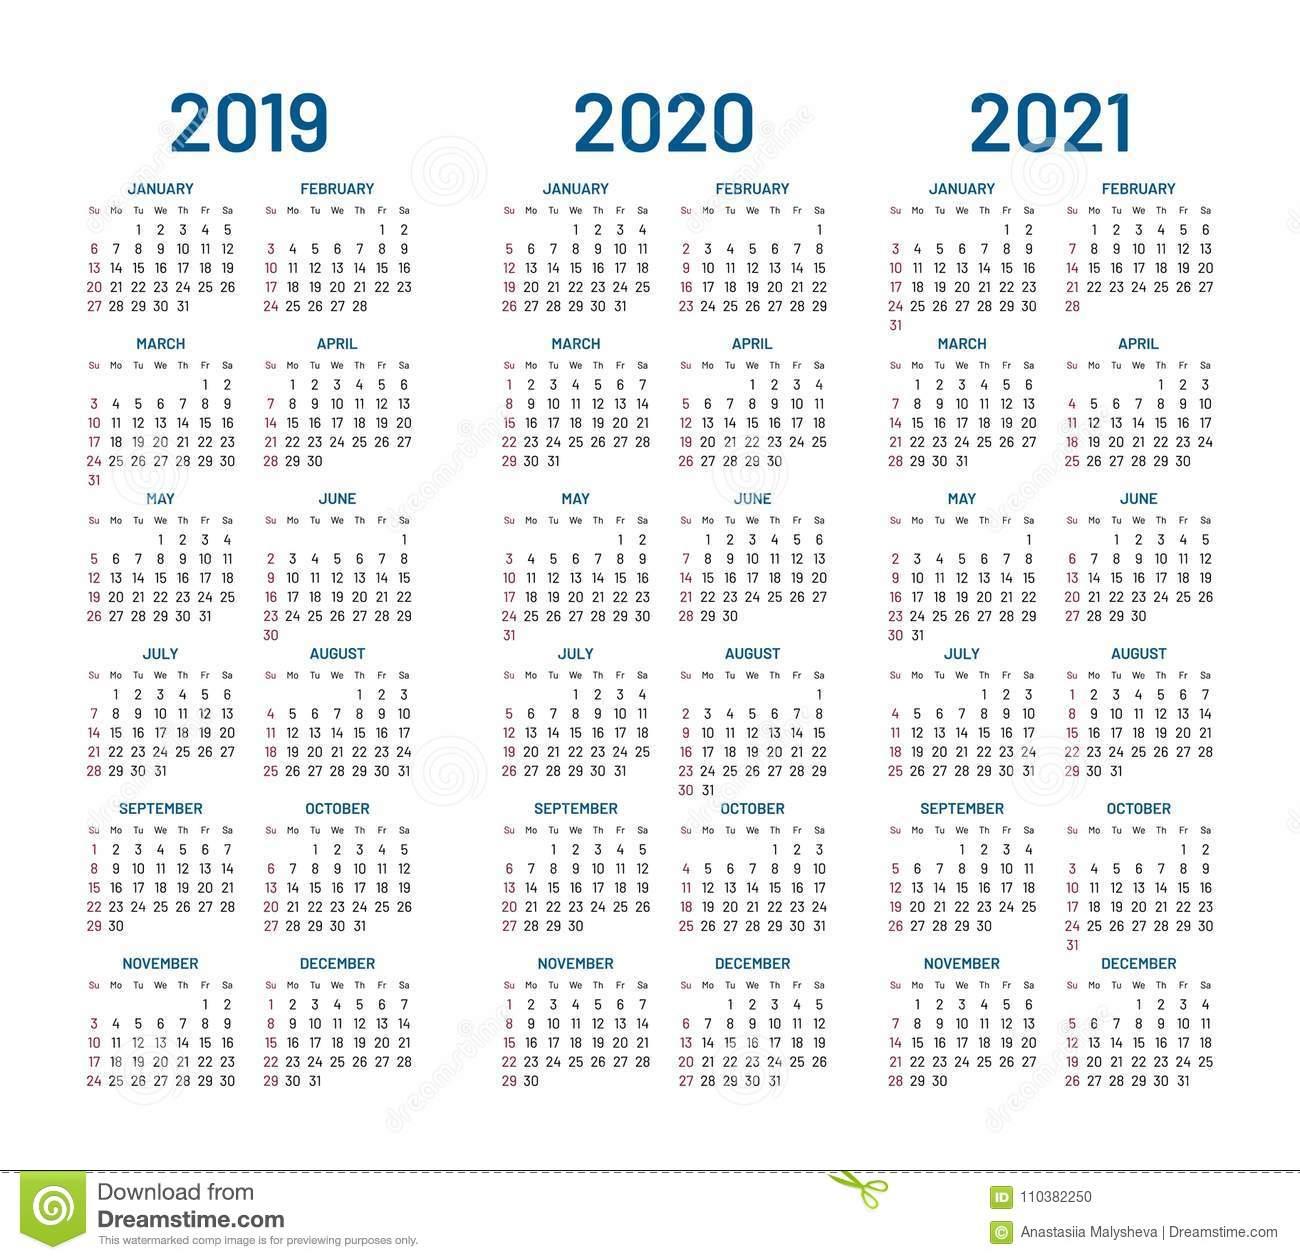 454 Retail Calendar 2019 Vs 2020 – Samyysandra In 2020 National Retail Federation 4 5 4 Printable Calendar